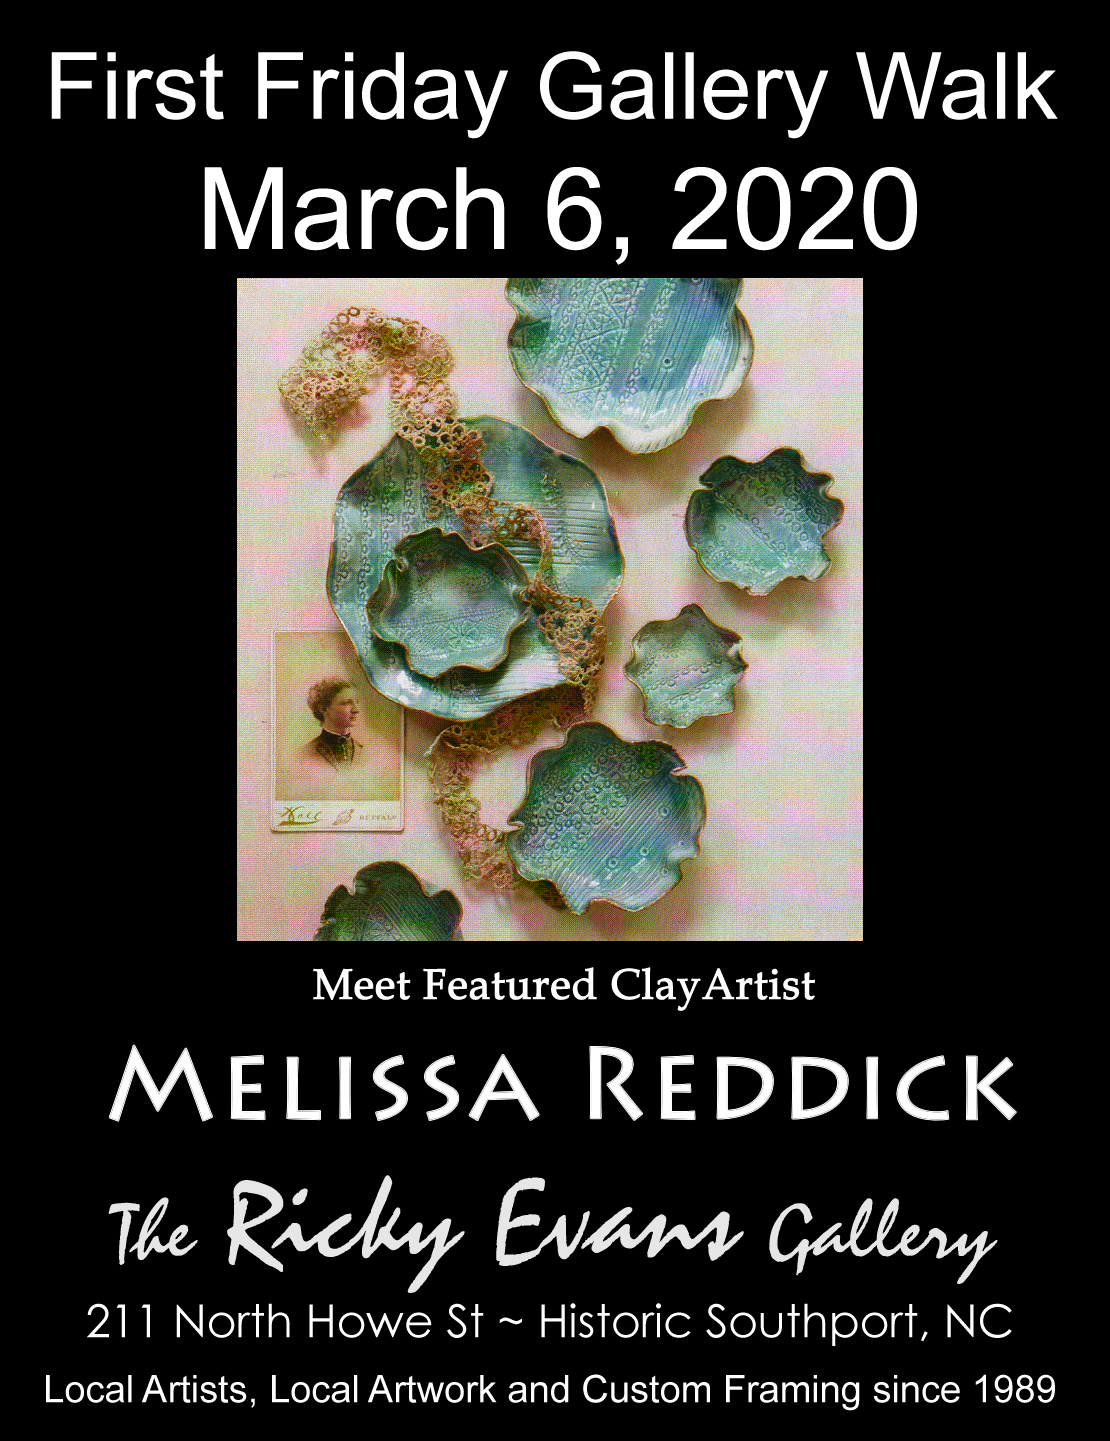 Meet featured clay artist Melissa Reddick